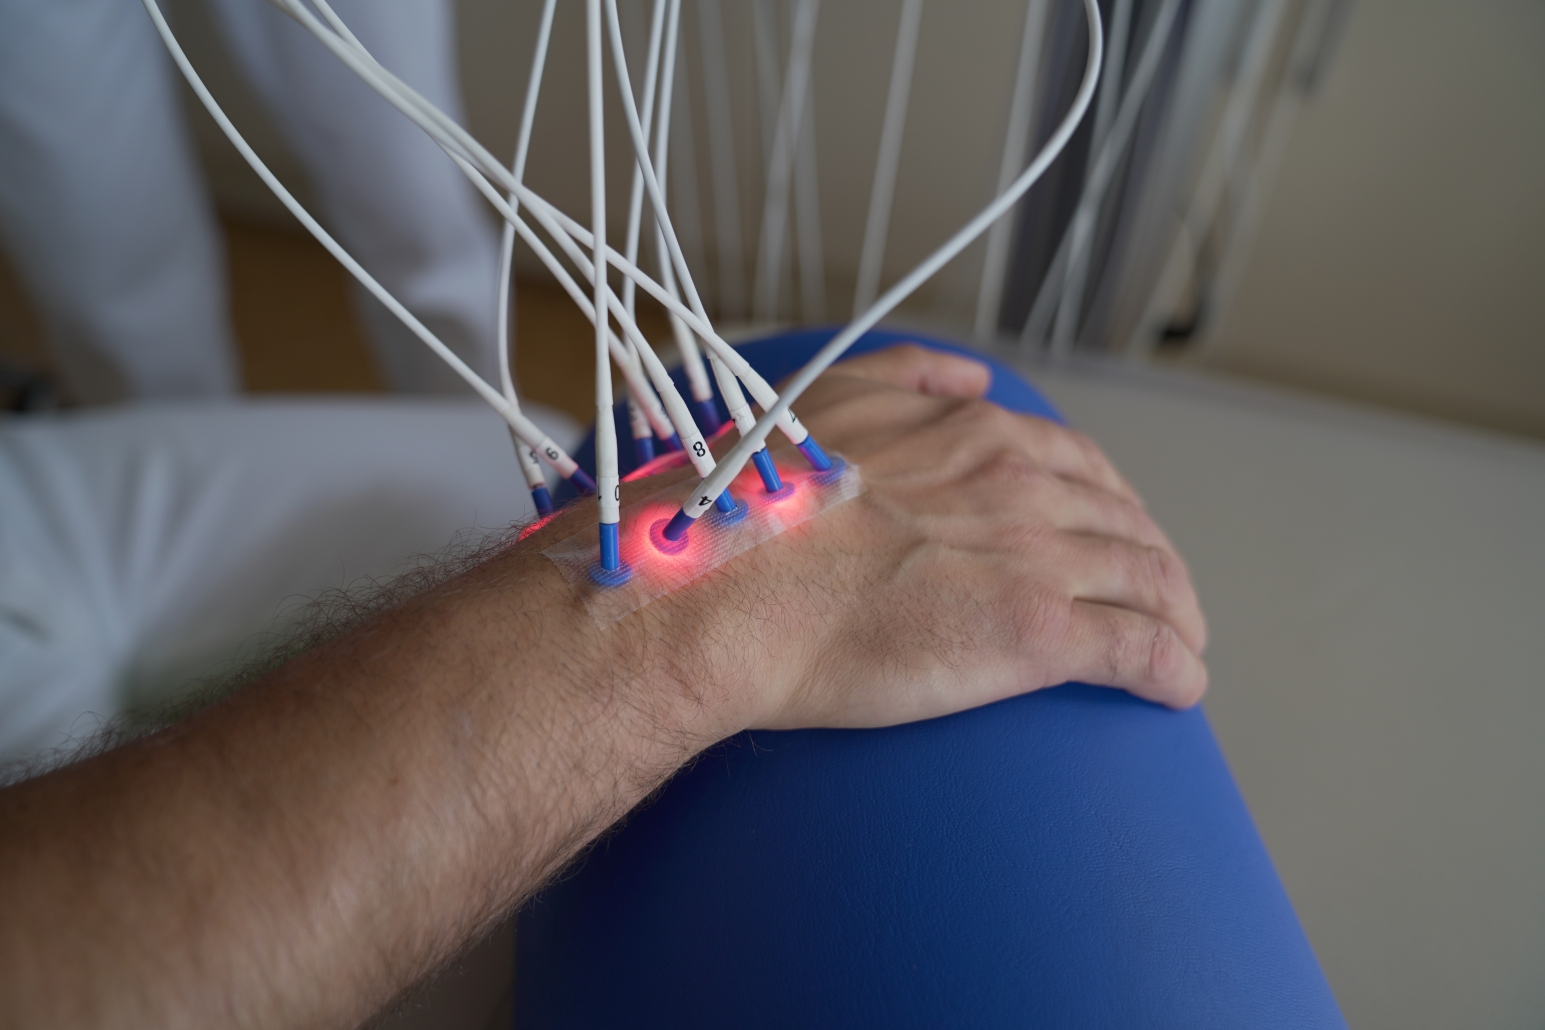 Laserneedle-Therapie